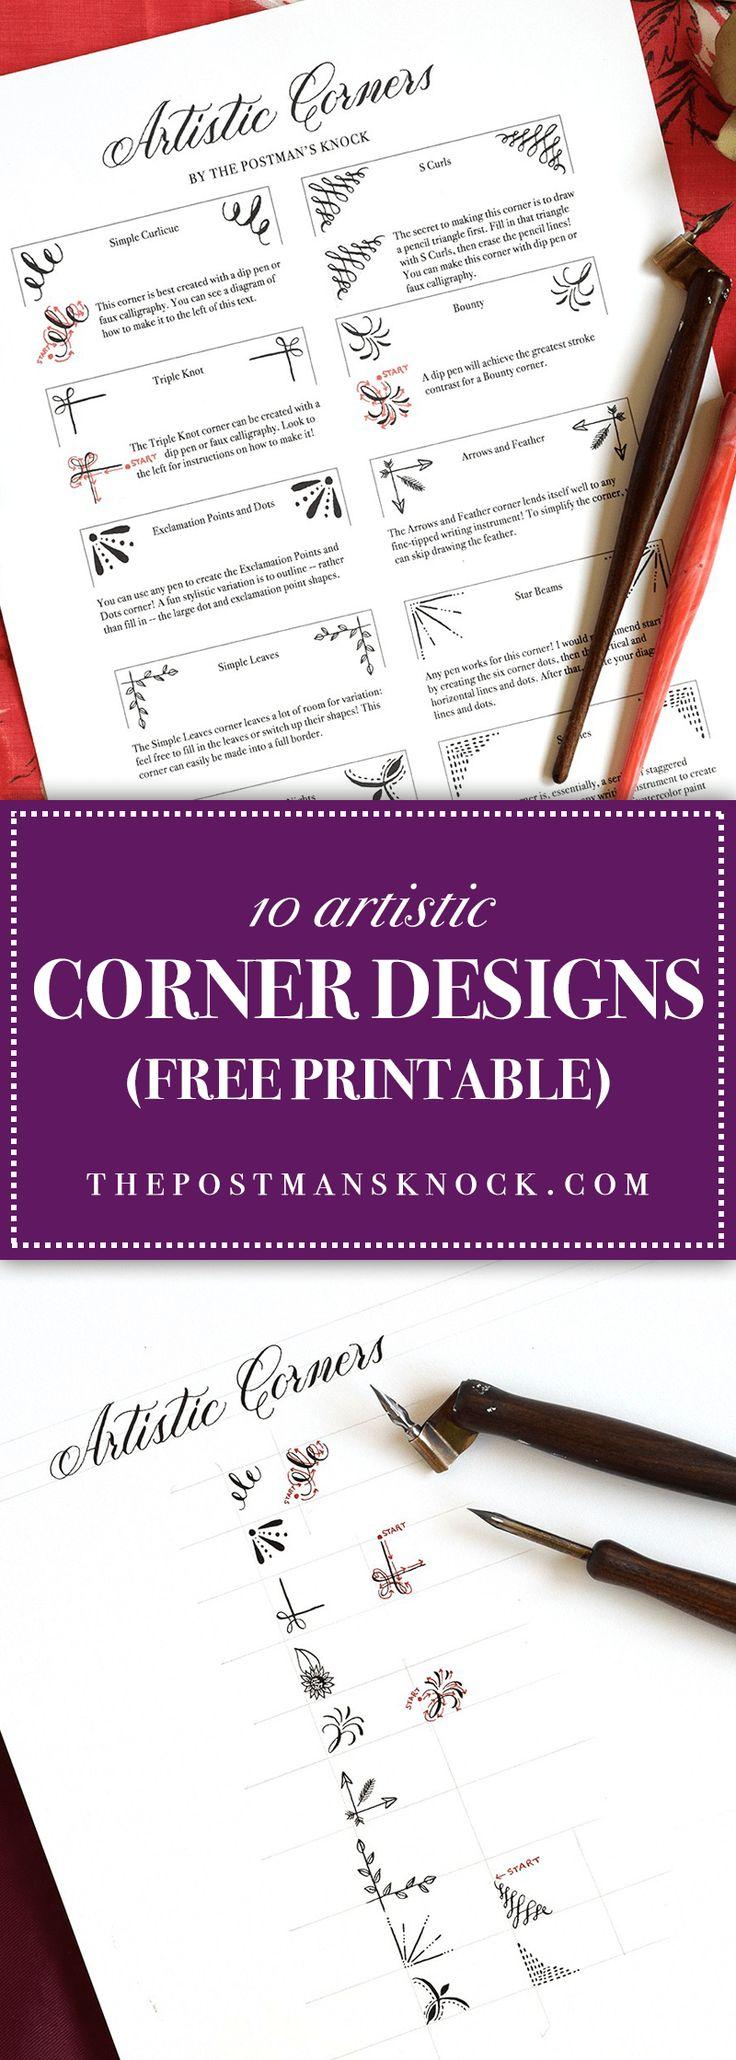 10 Artistic Corner Designs Includes Free Printable